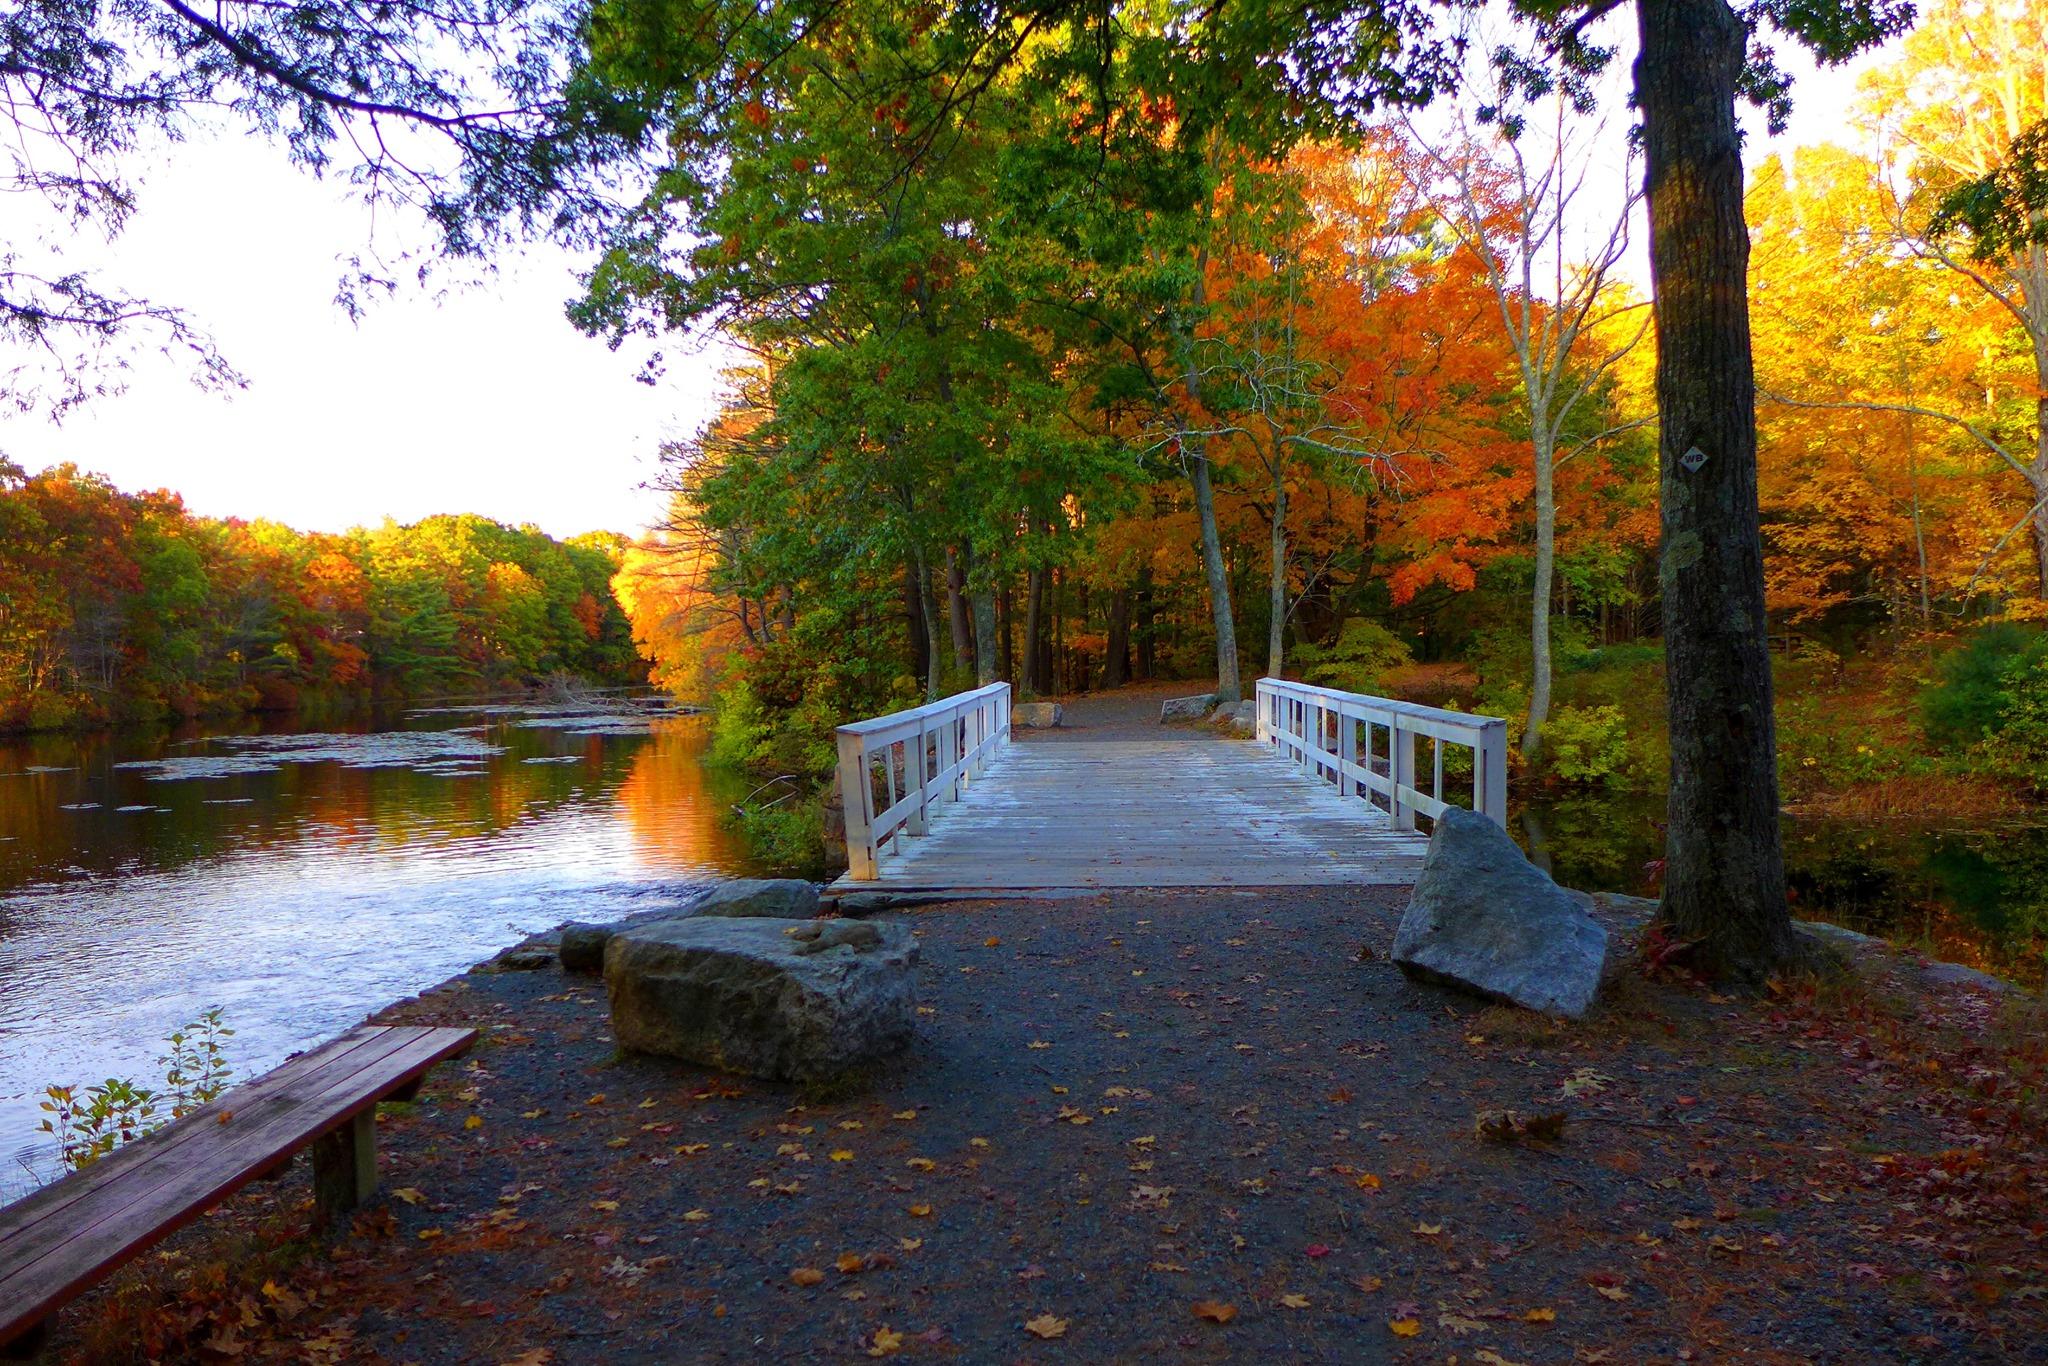 White's Bridge at Walpole Town Forest in Walpole, Massachusetts.